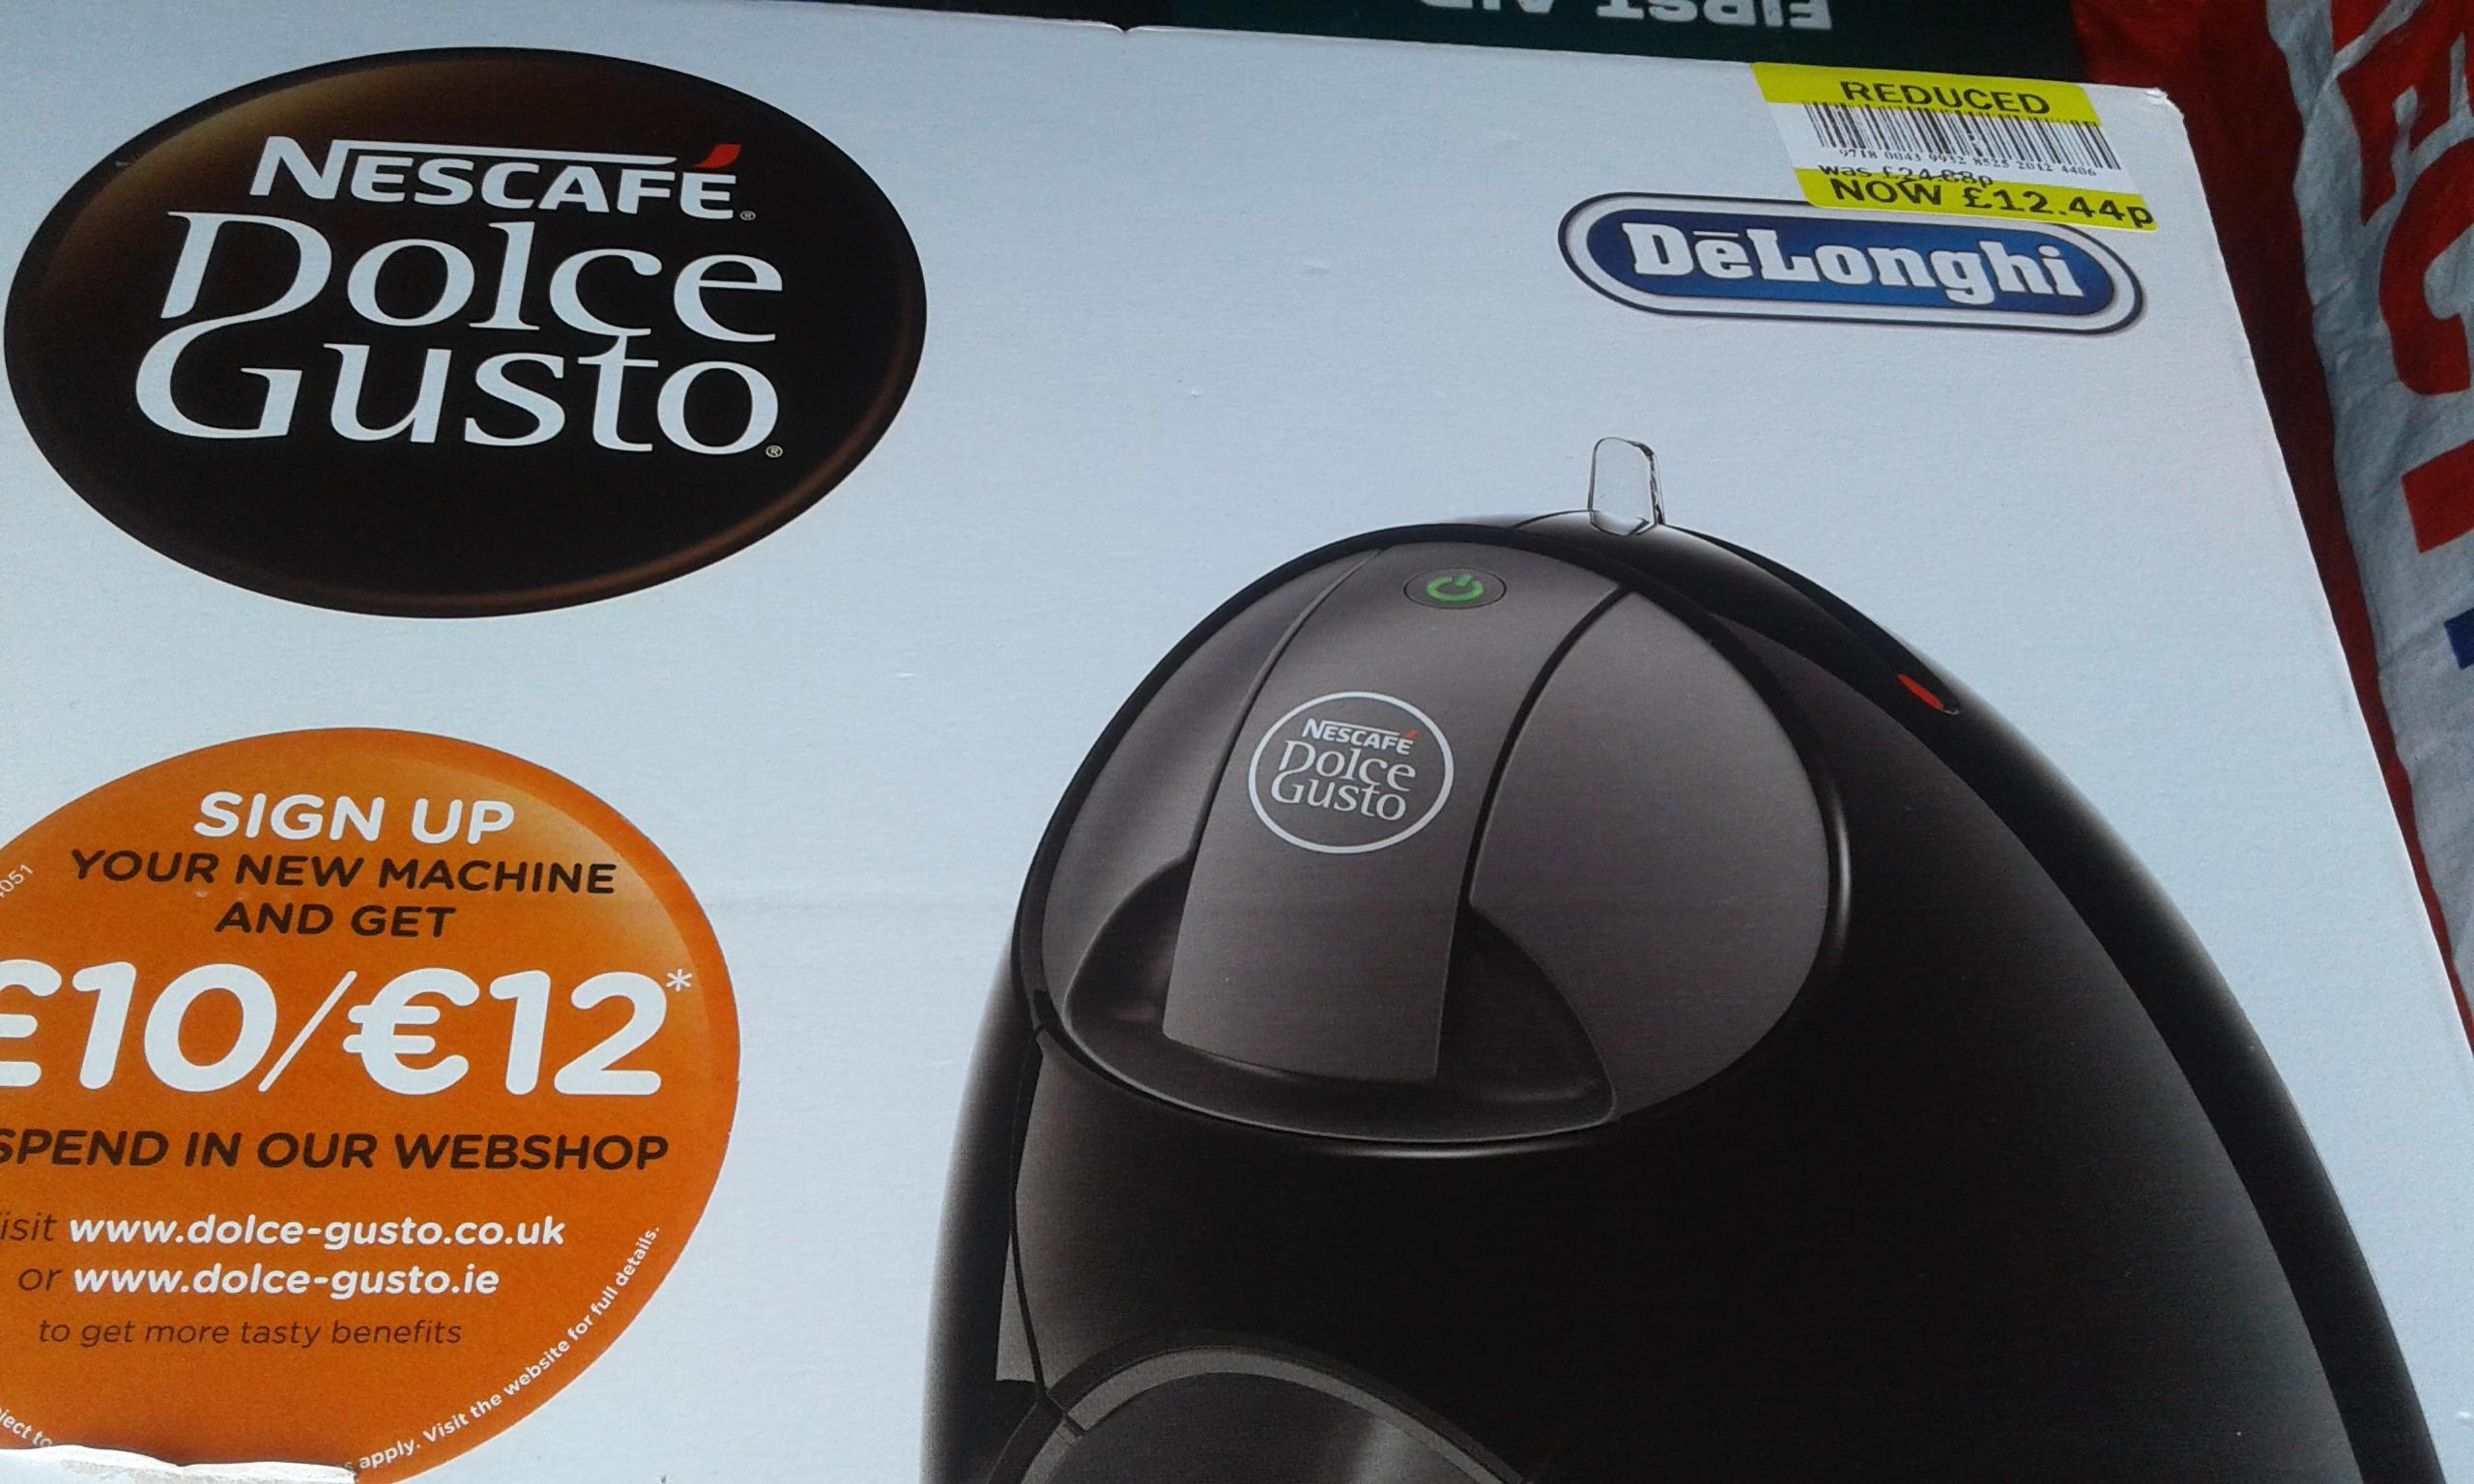 Nescafe Dolce Gusto Jovia machine £12.44 @ Tesco Thetford